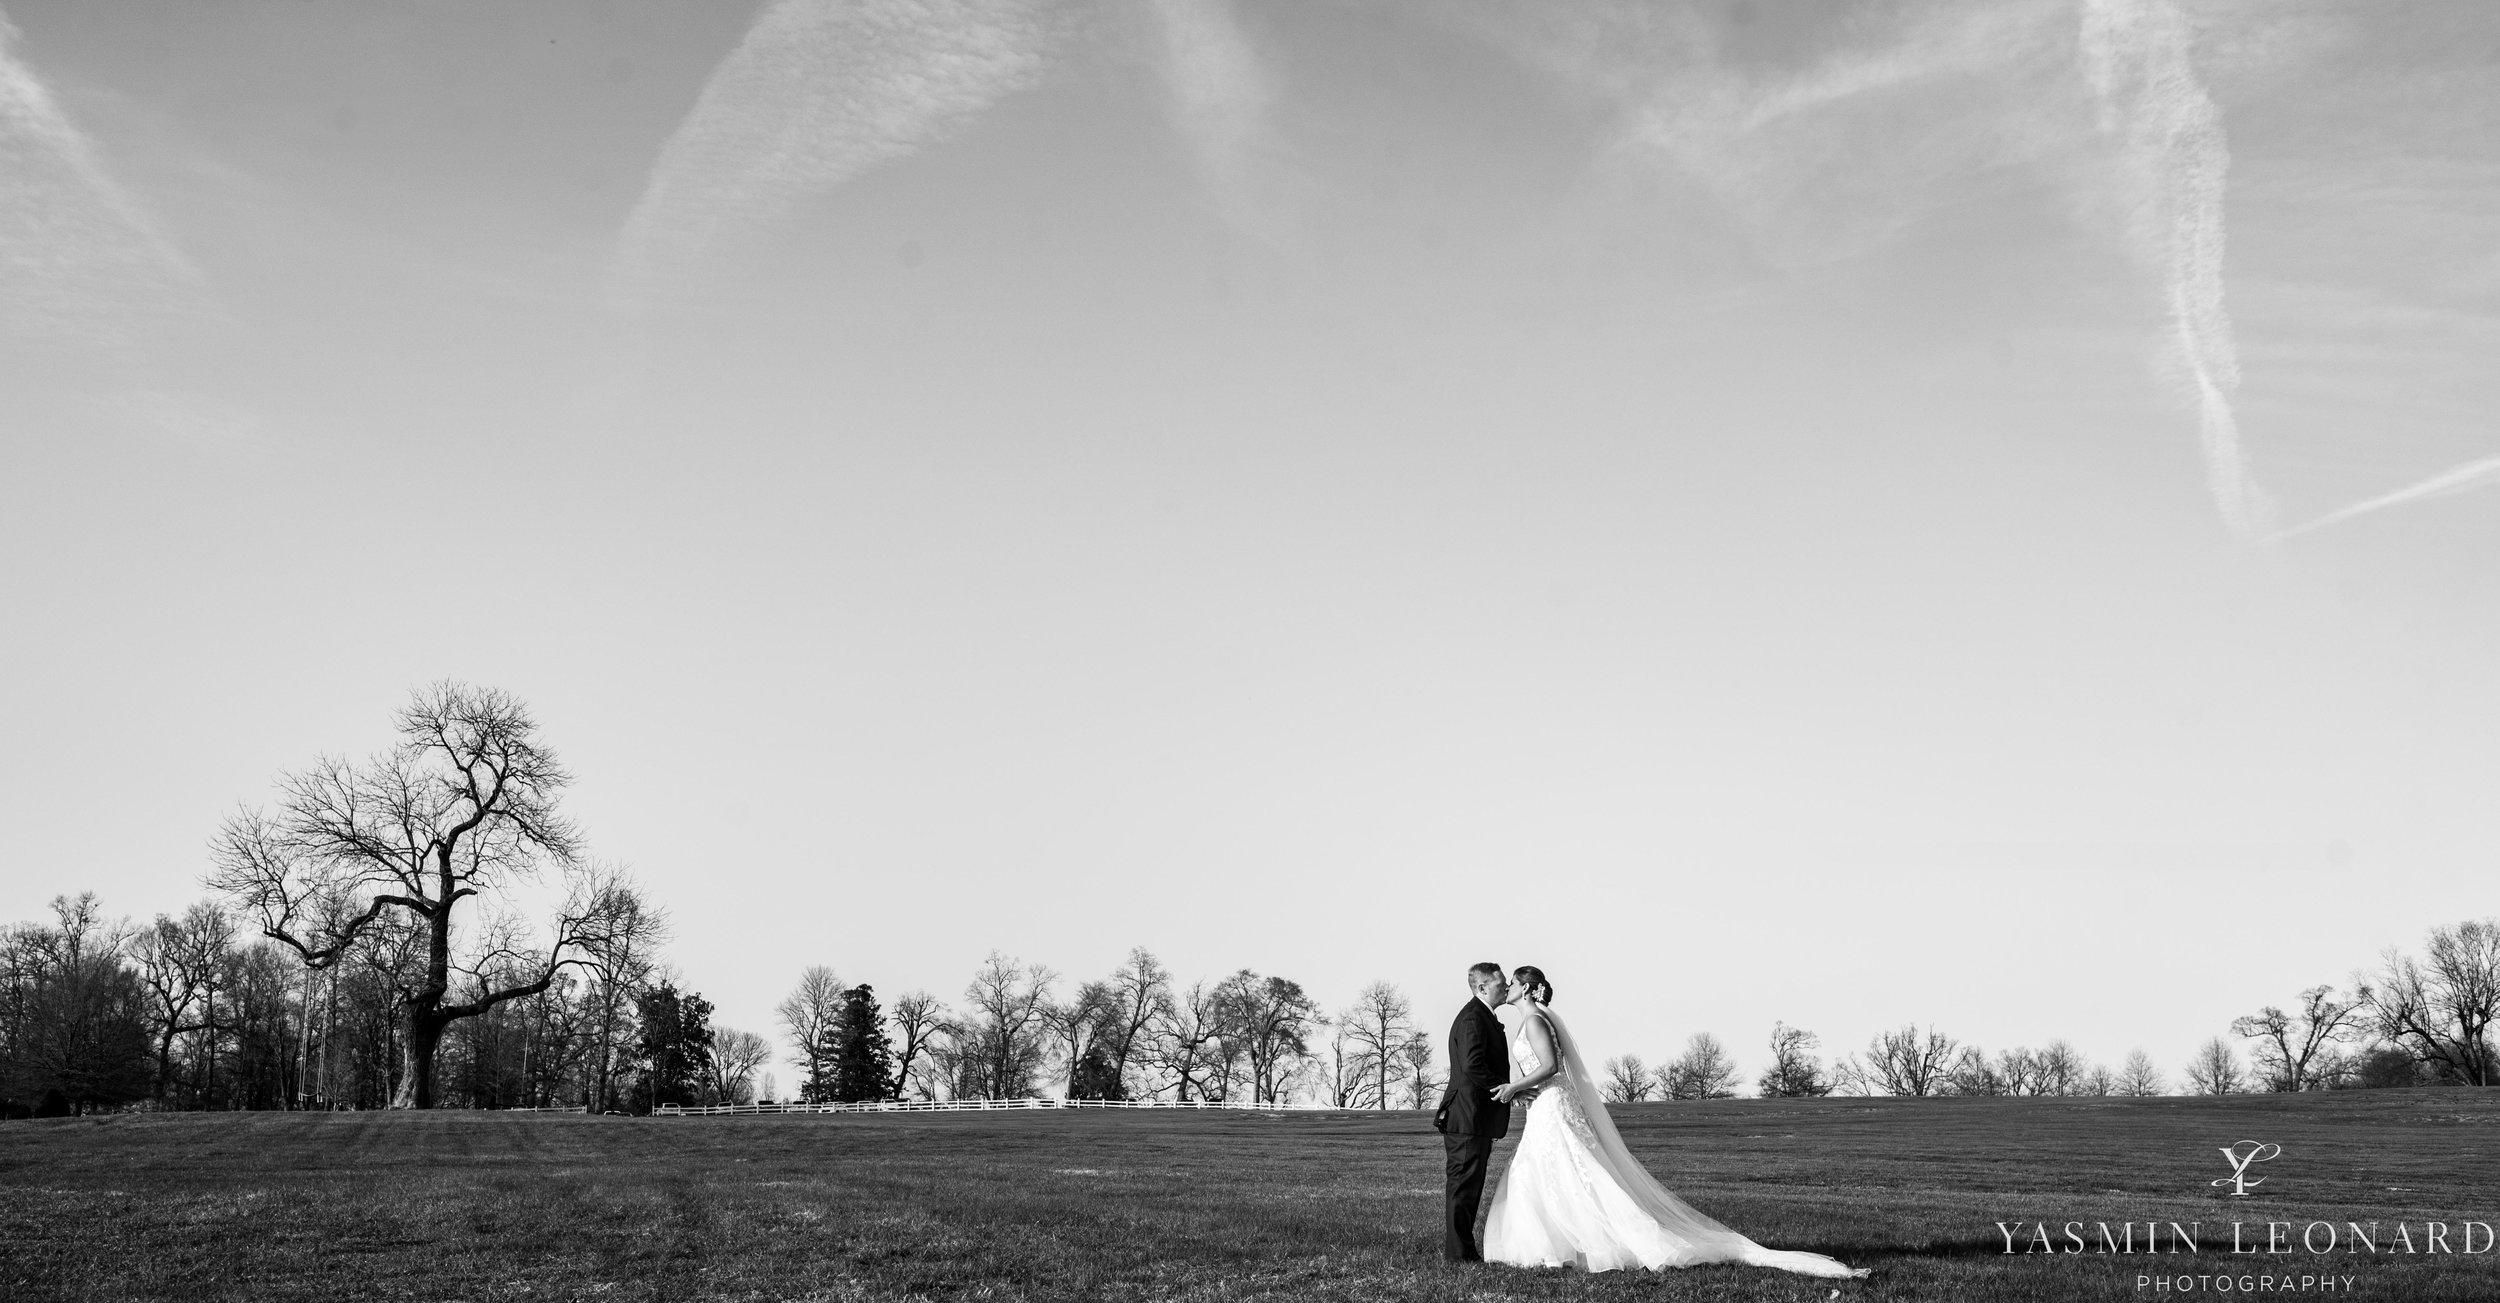 Adaumont Farm - Adaumont Farm Weddings - Trinity Weddings - NC Weddings - Yasmin Leonard Photography-48.jpg